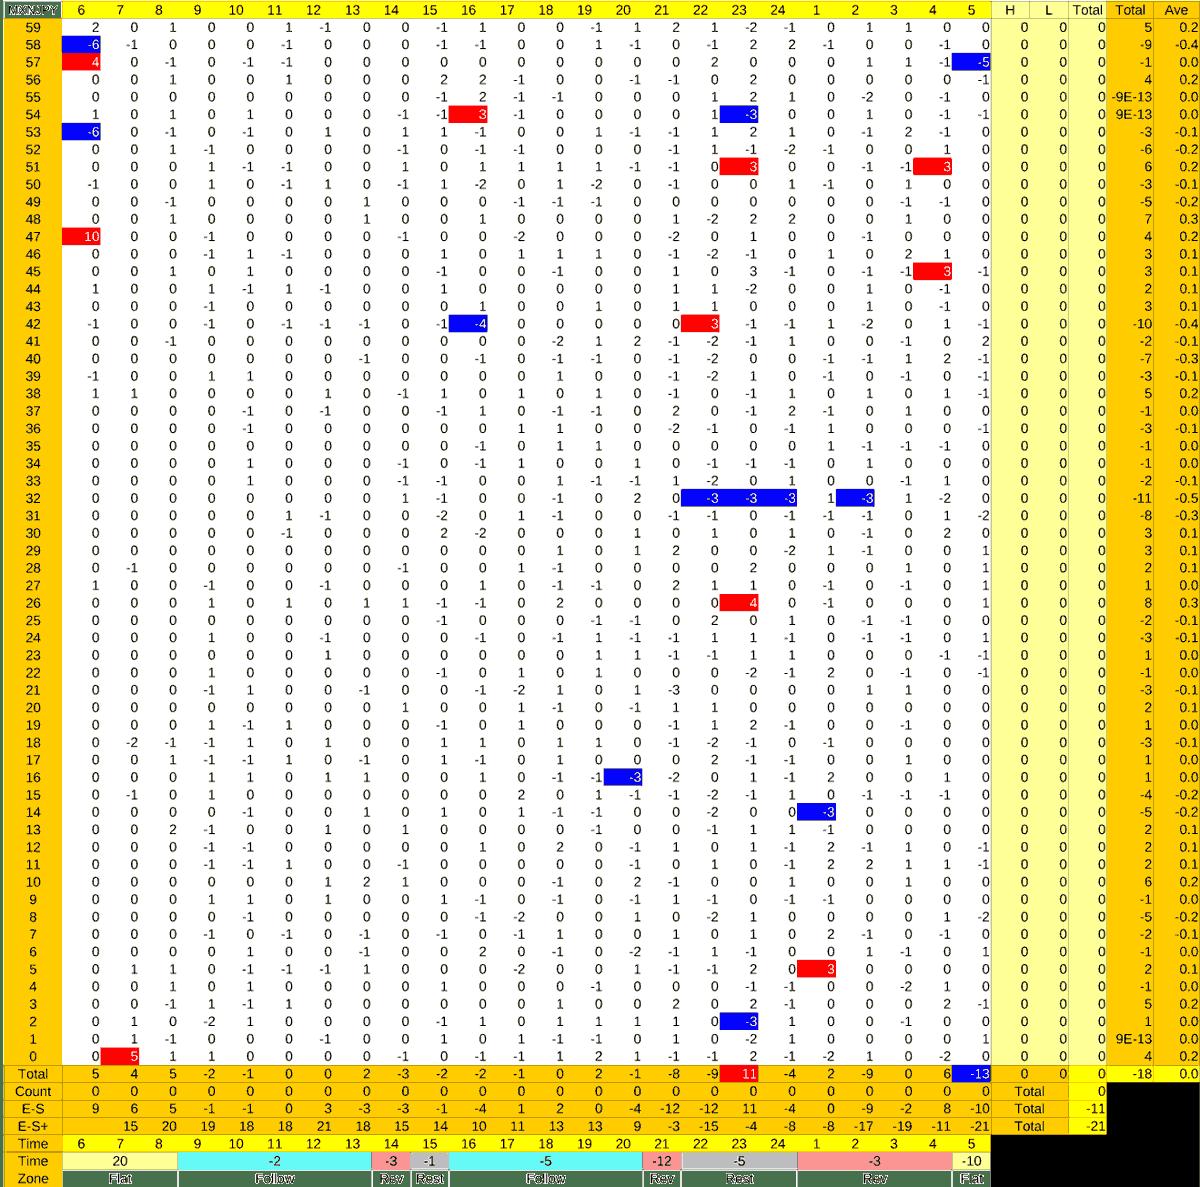 20210518_HS(3)MXNJPY